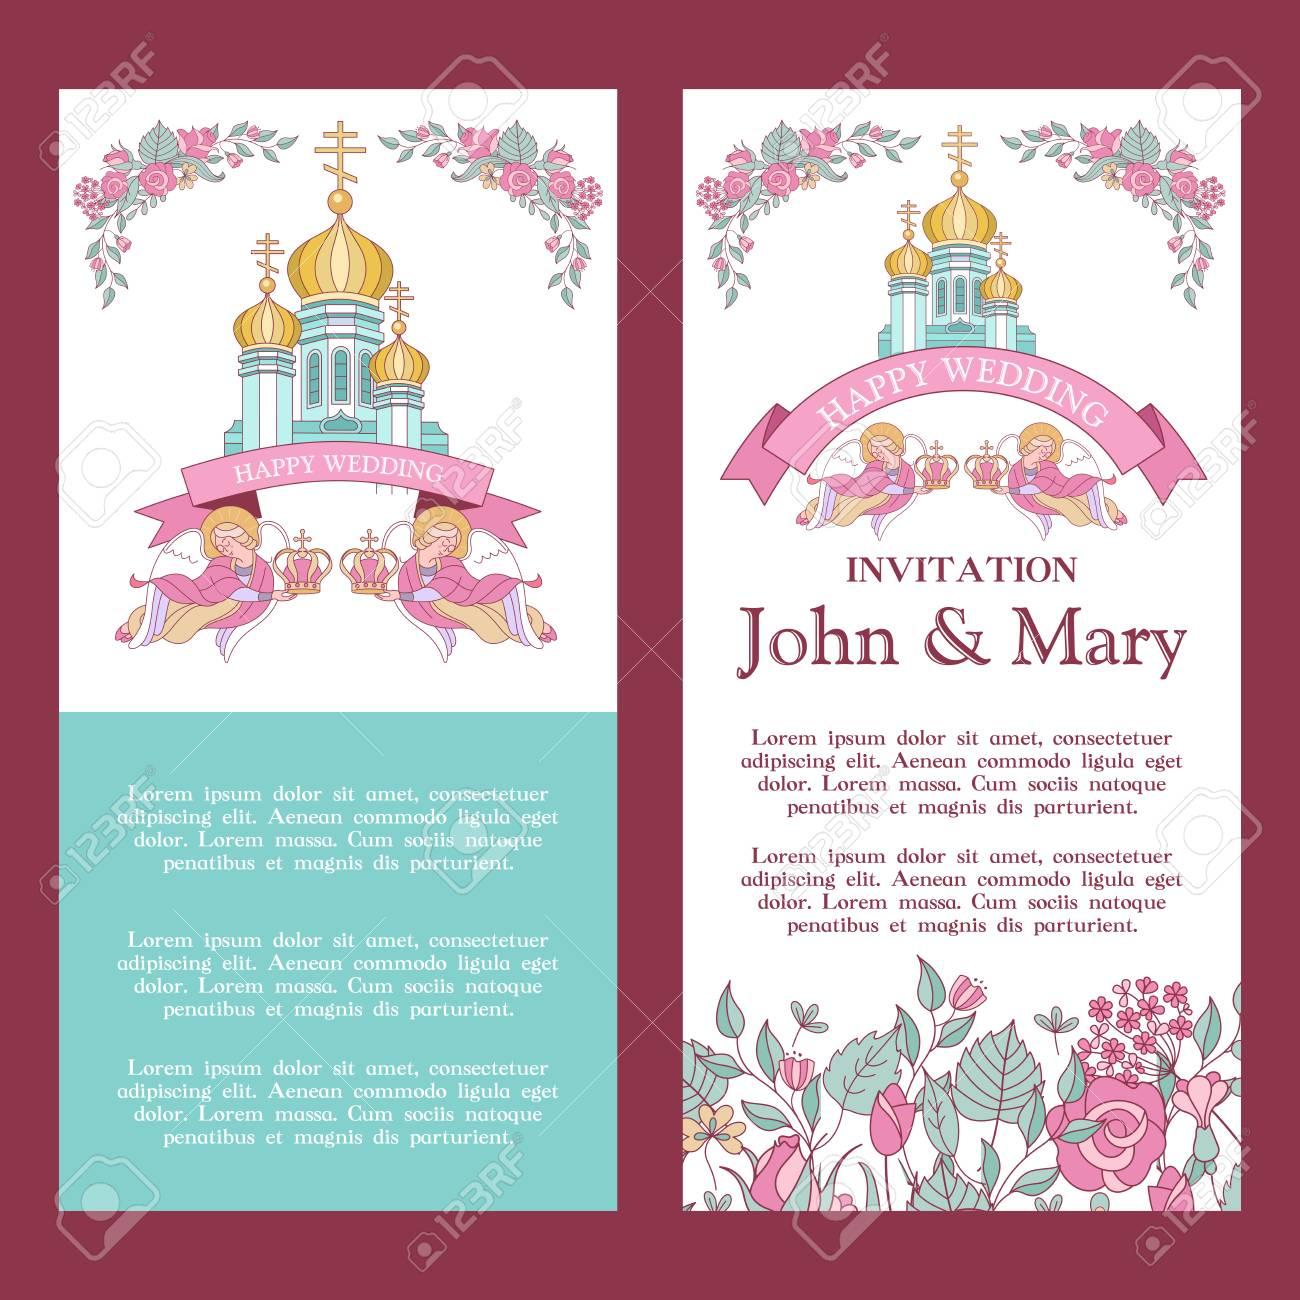 Elegant Wedding Invitation Vector Illustration Greeting Card